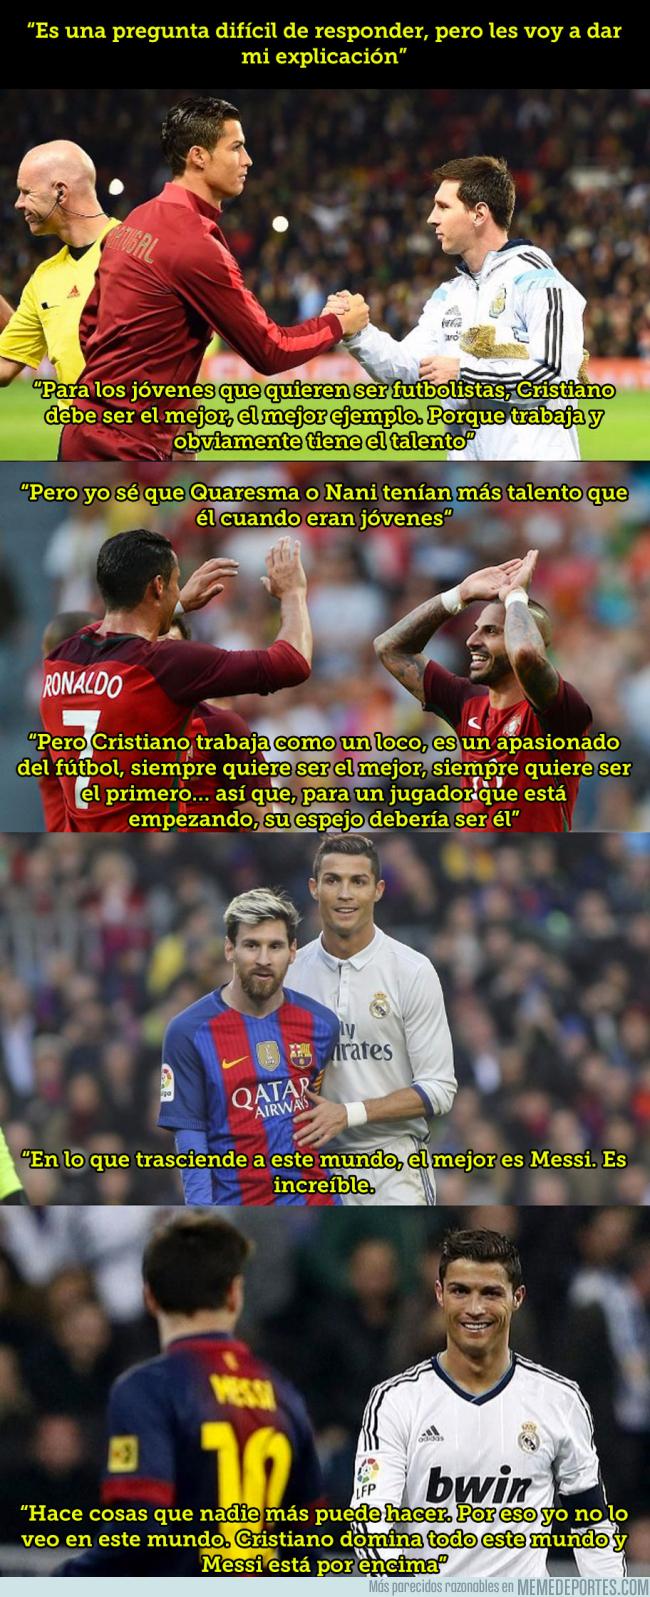 991612 - ¿Messi o Cristiano Ronaldo? Kevin-Prince Boateng responde